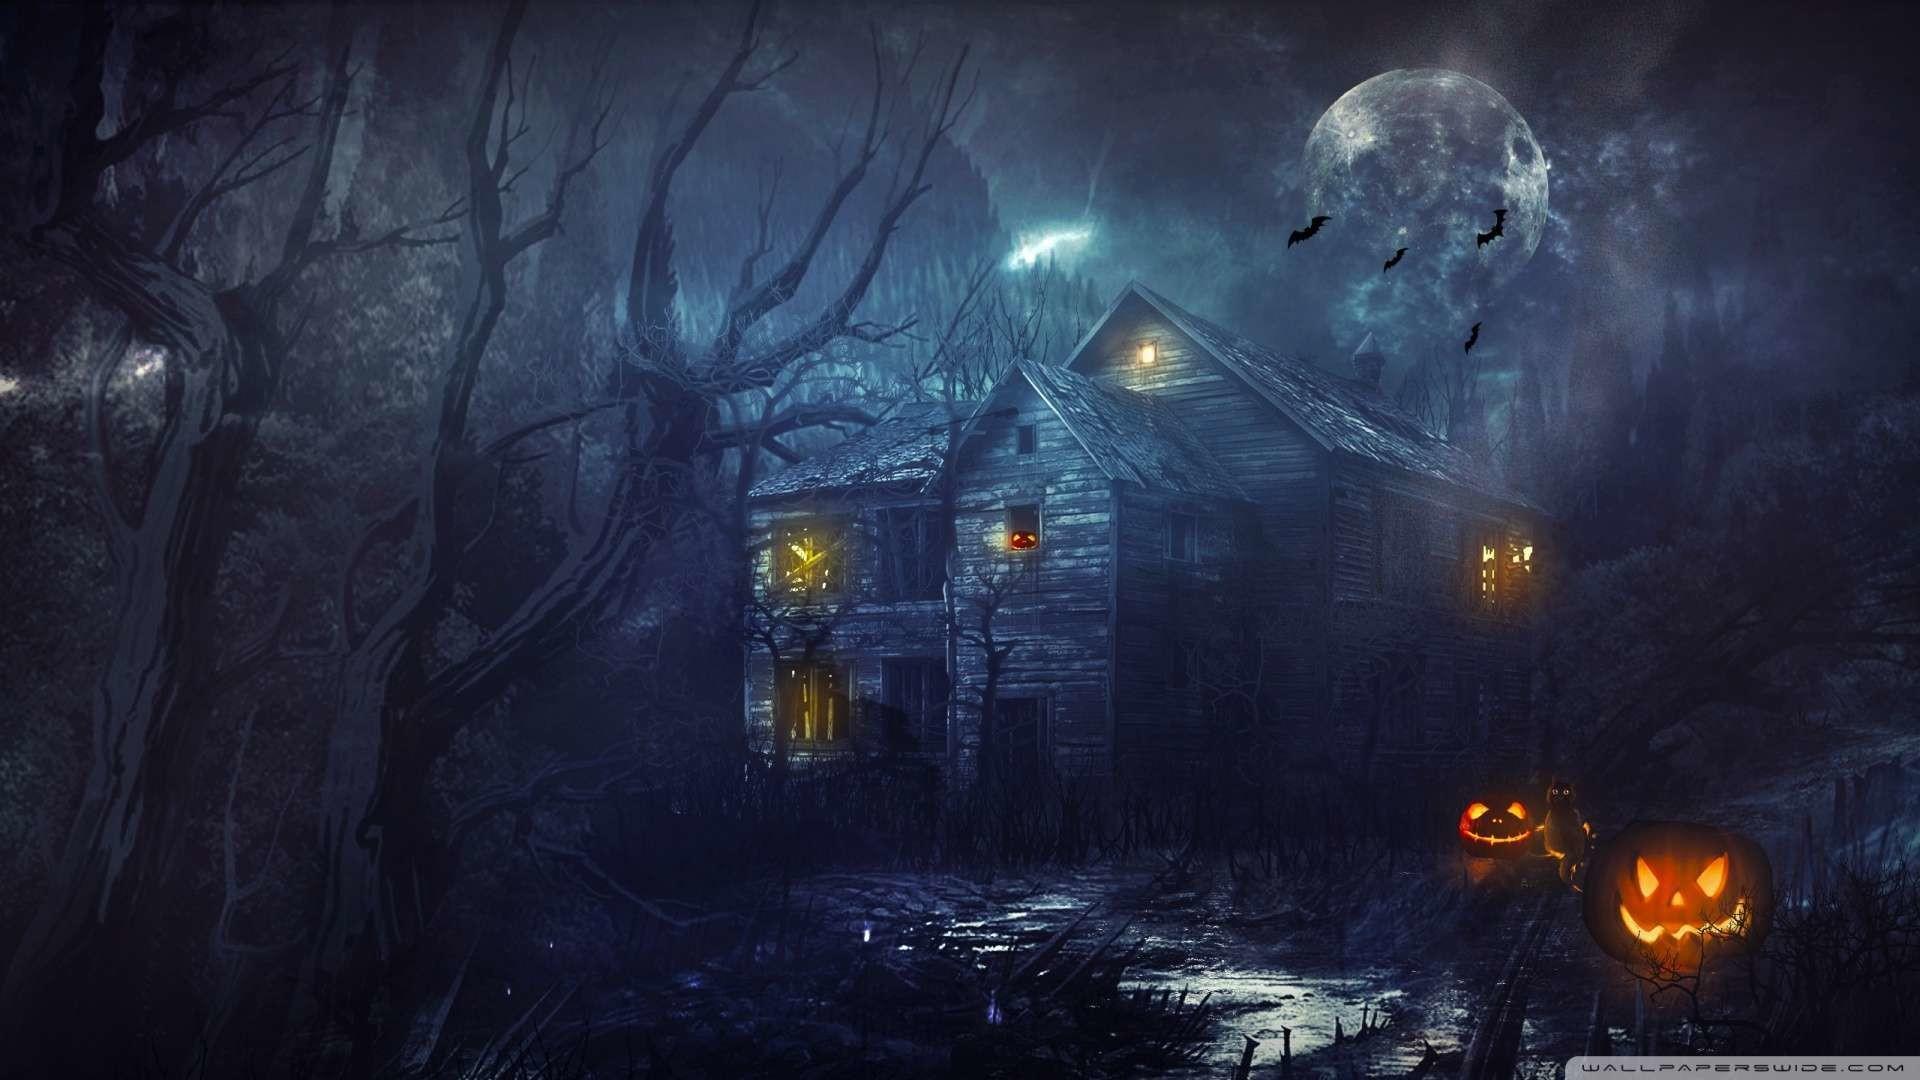 Halloween Background Hd.Hd Halloween Wallpapers 1080p 77 Images